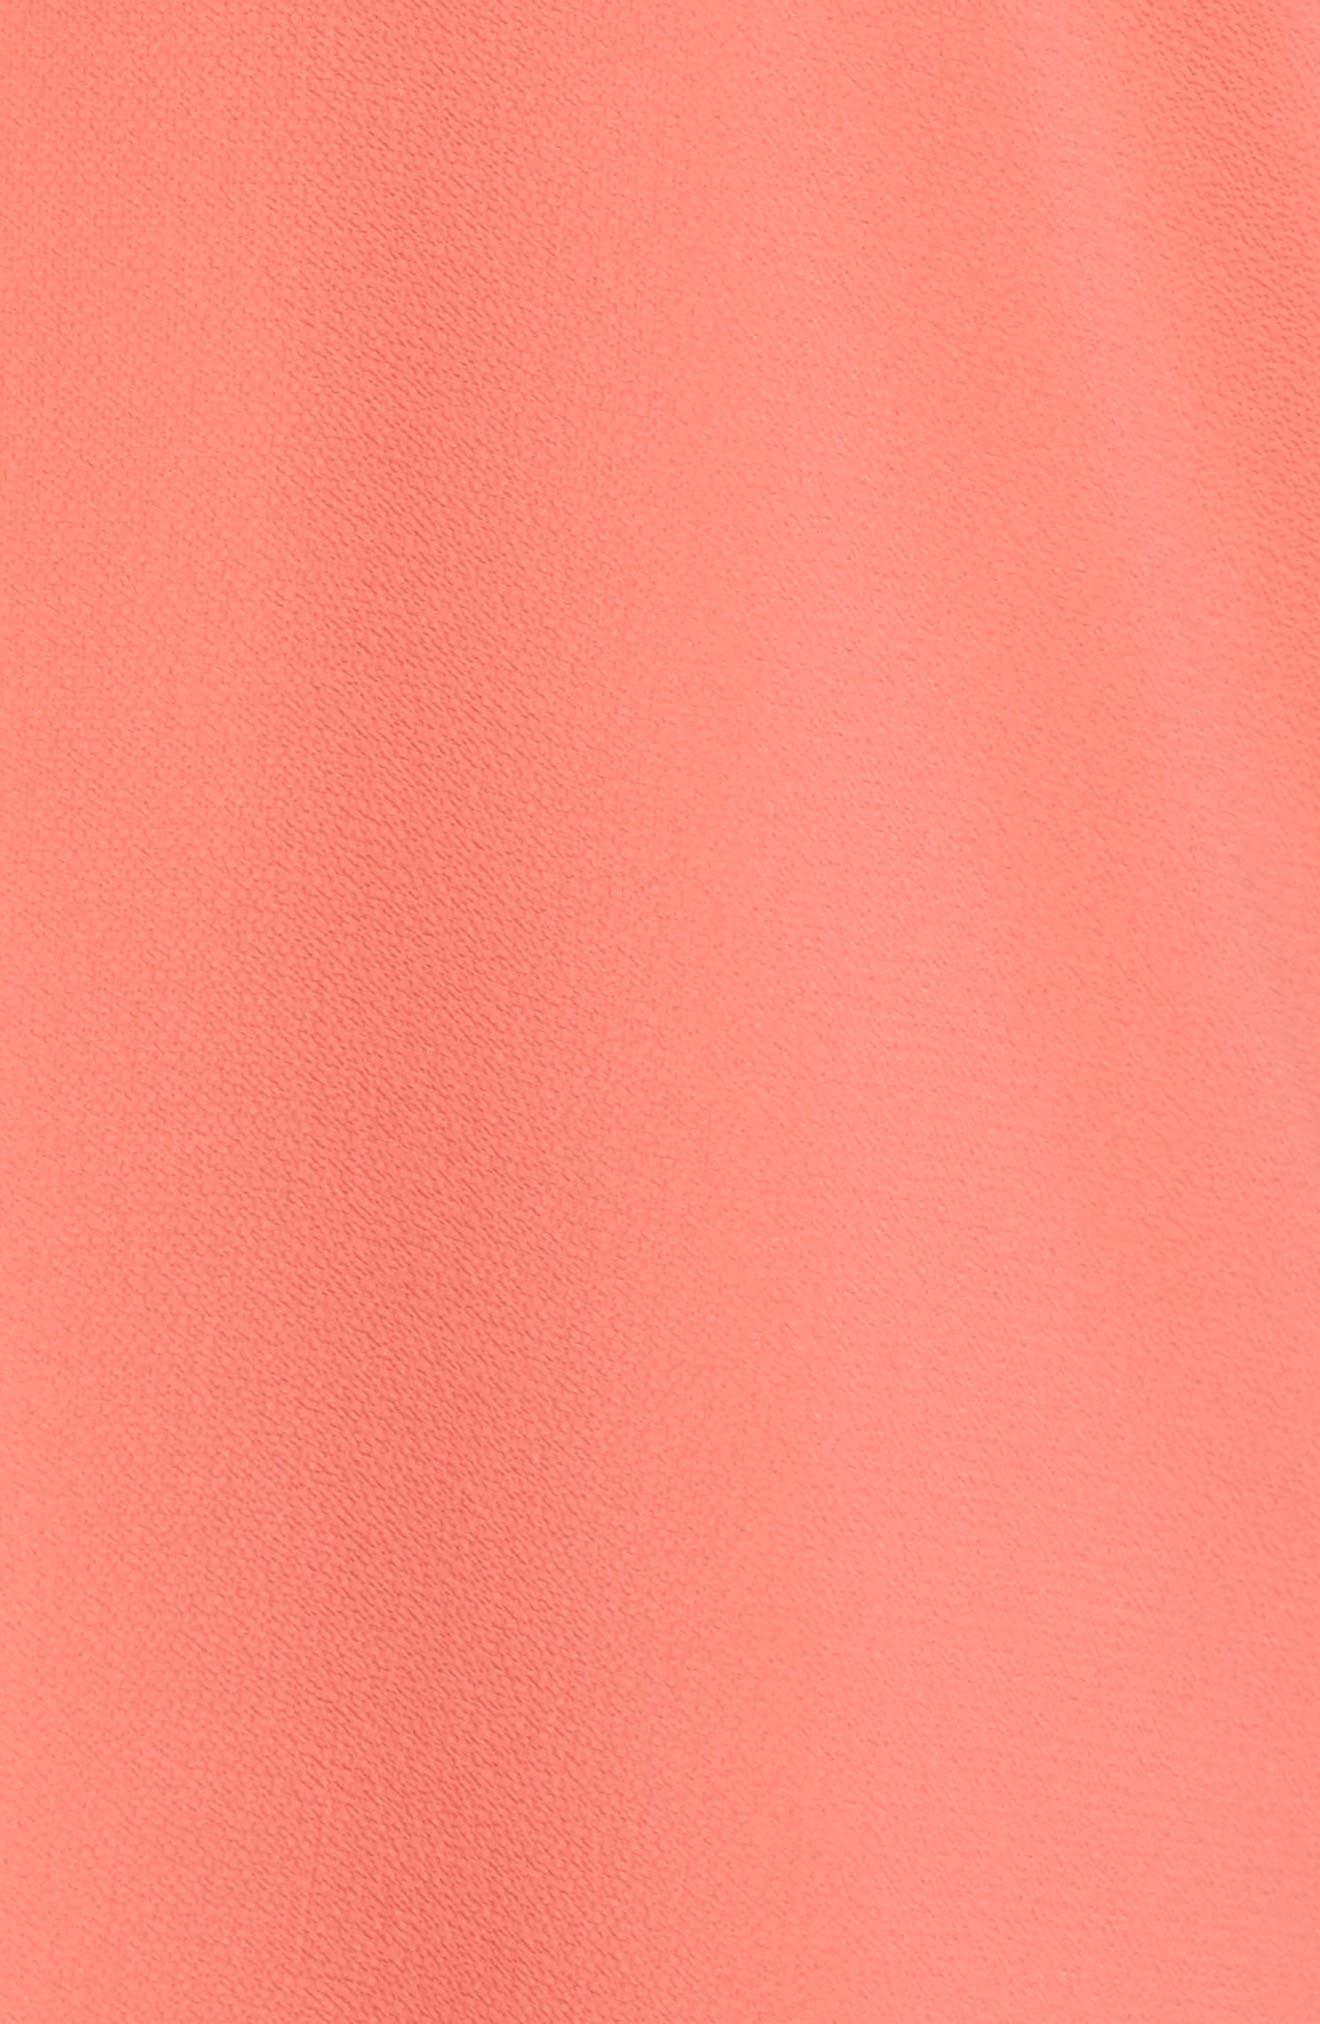 Crepe Blouse,                             Alternate thumbnail 5, color,                             655